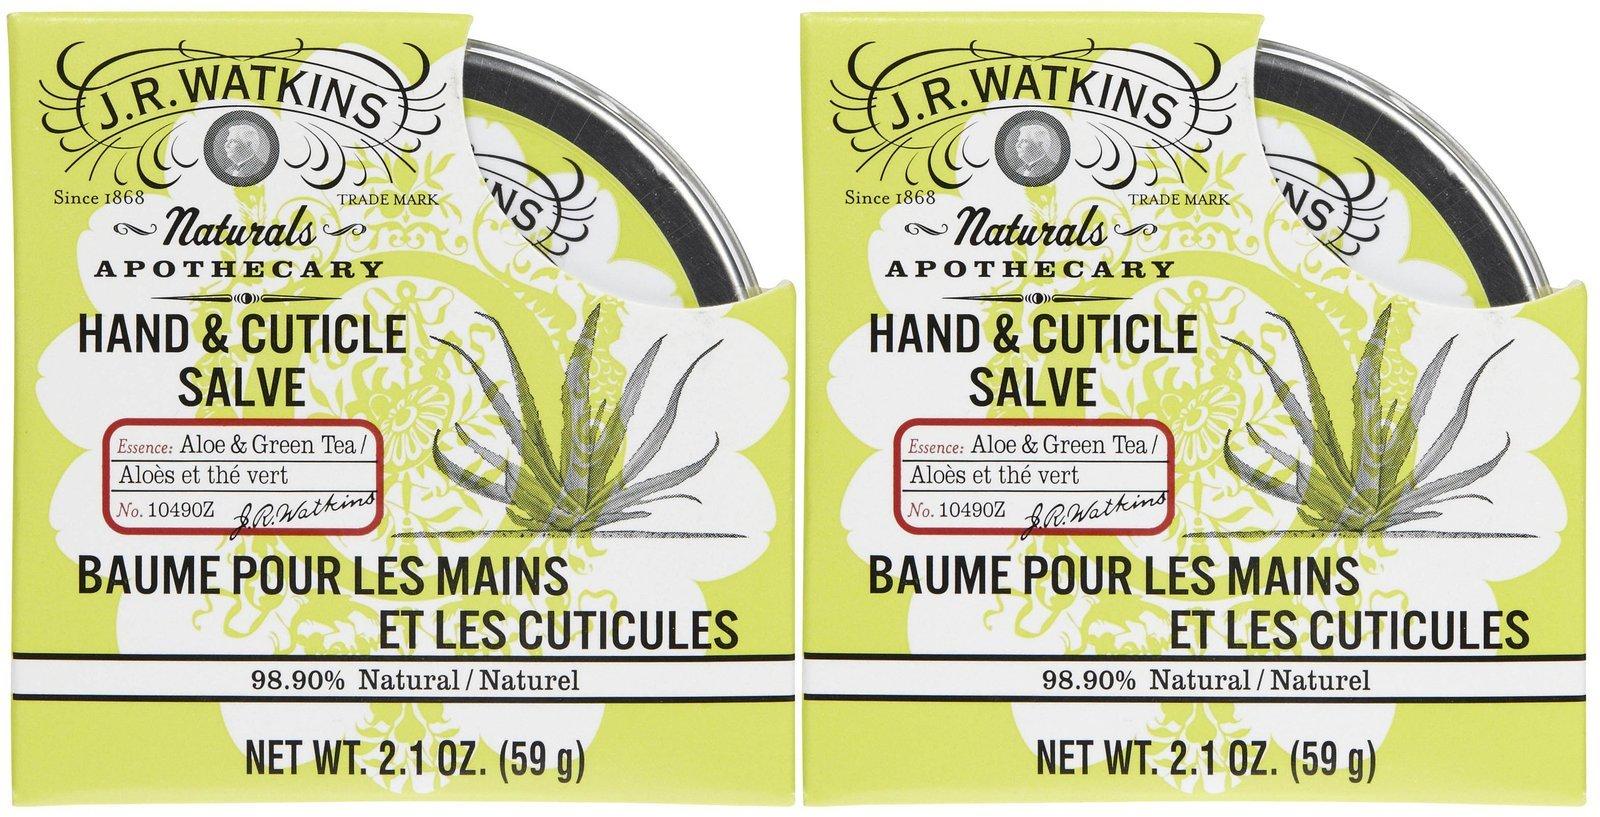 J. R. Watkins Hand & Cuticle Salve - Aloe & Green Tea - 2.1 oz - 2 pk